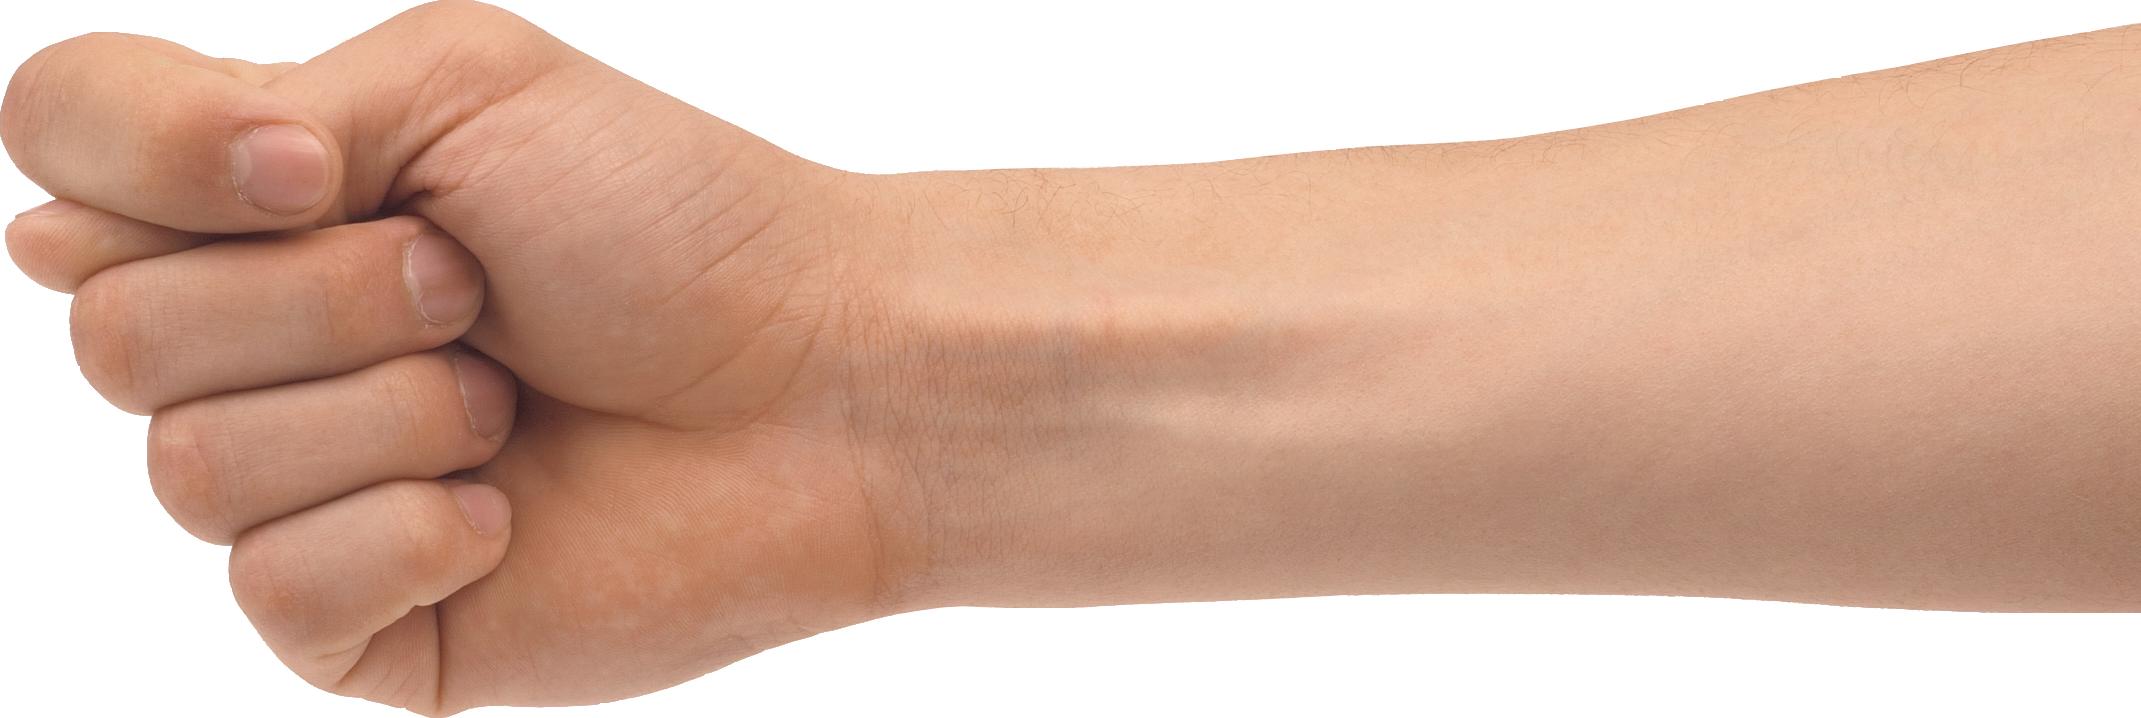 Hands seventy isolated stock. Hand clipart forearm